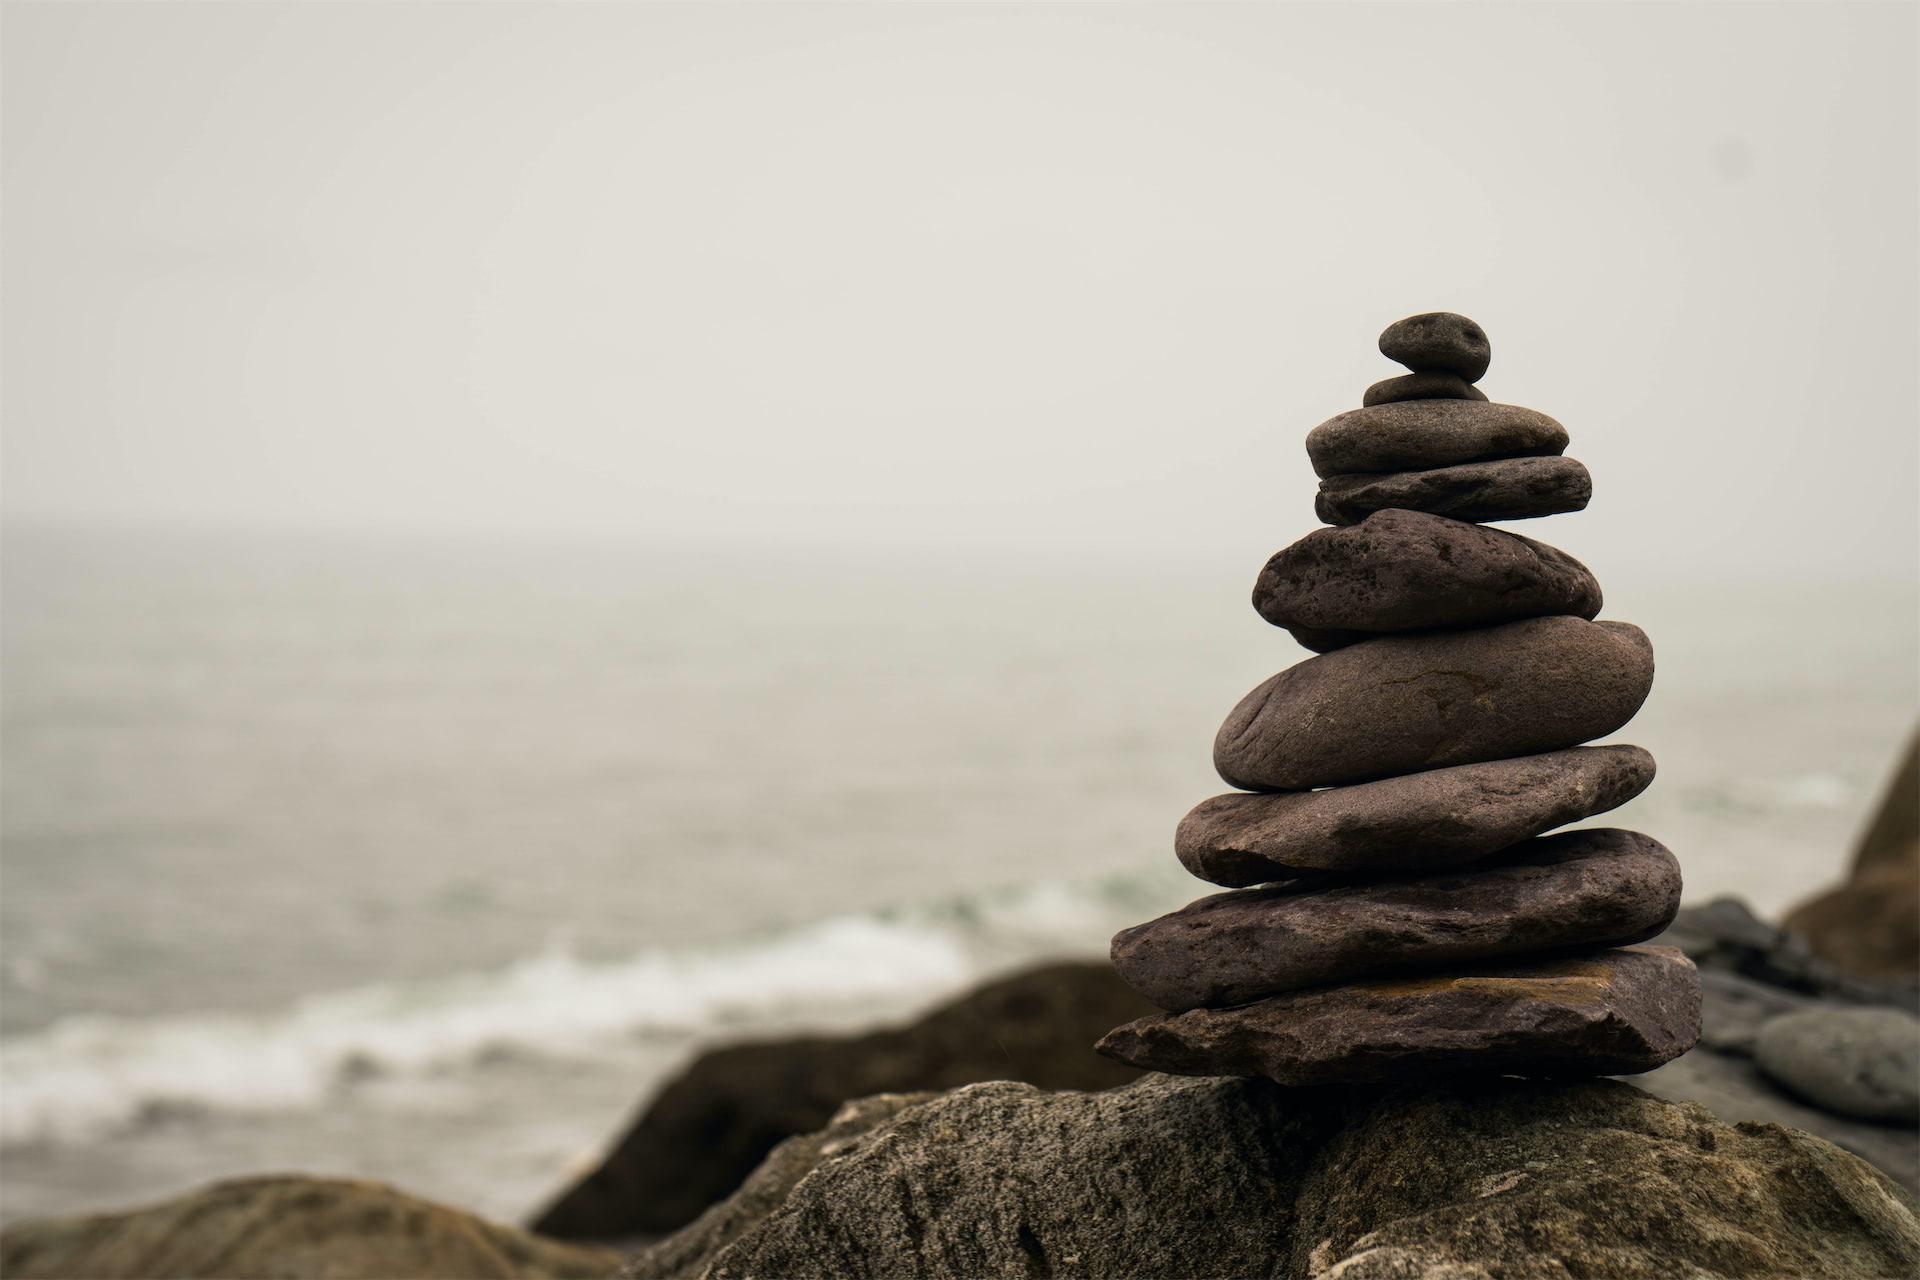 Mindfulness balance meditation- Piled Stones By the Sea